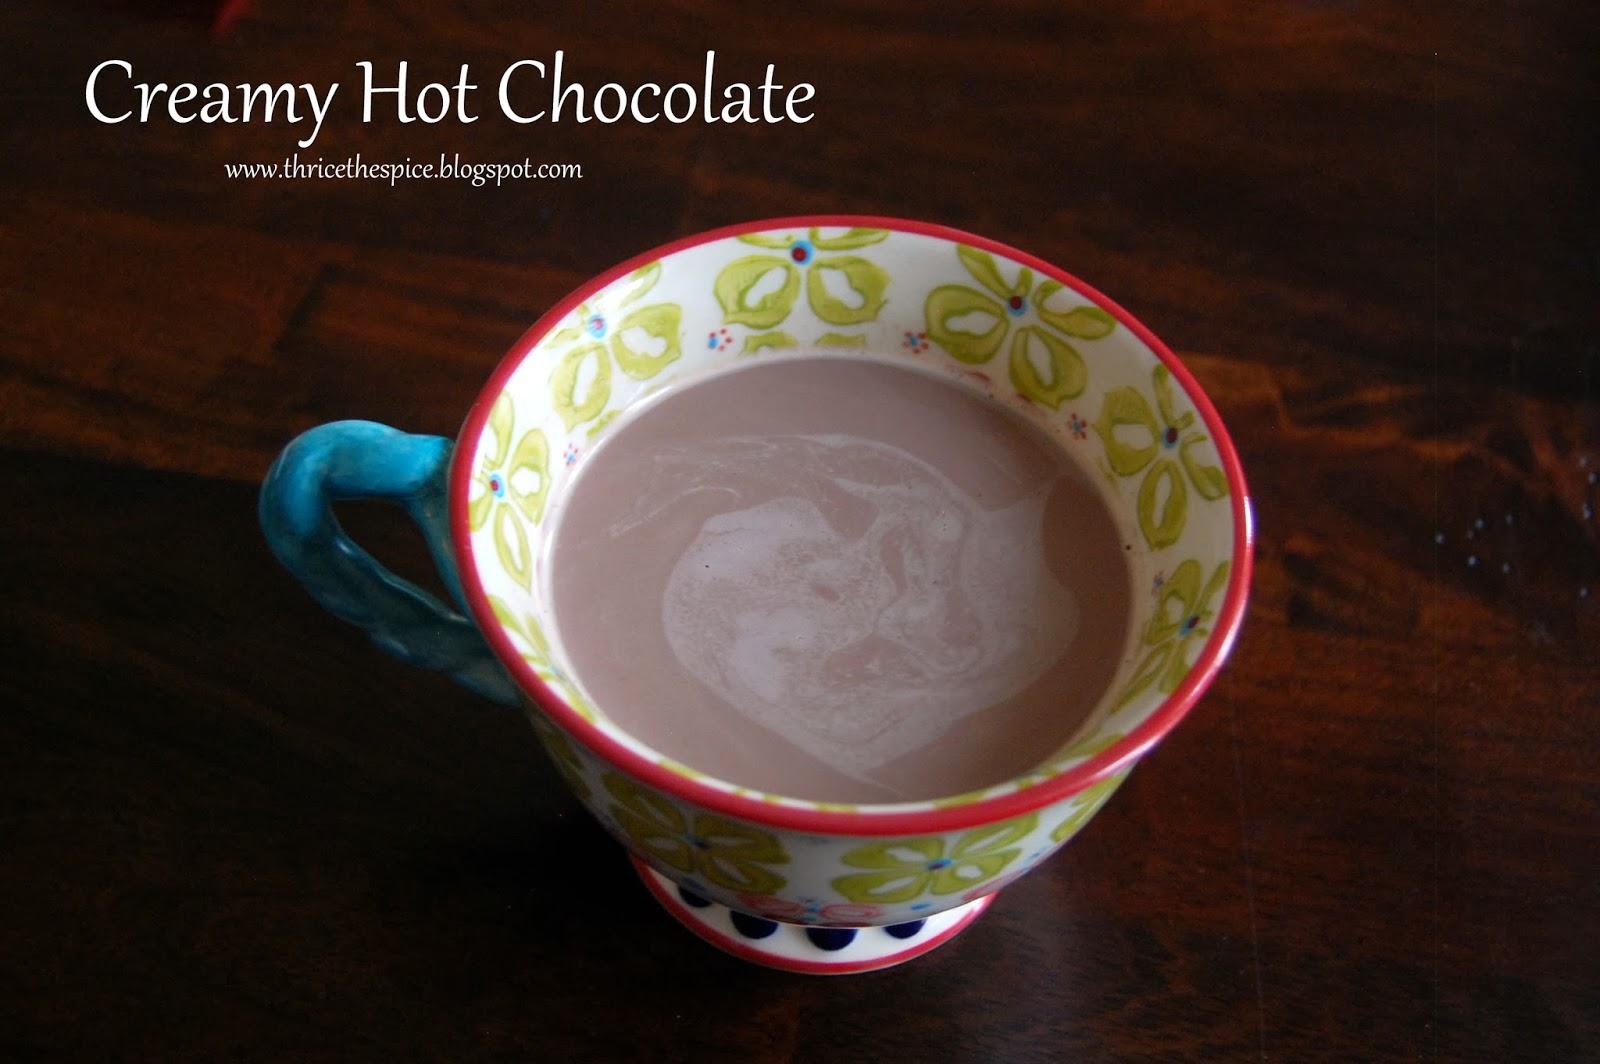 ThriceTheSpice: Creamy Hot Chocolate